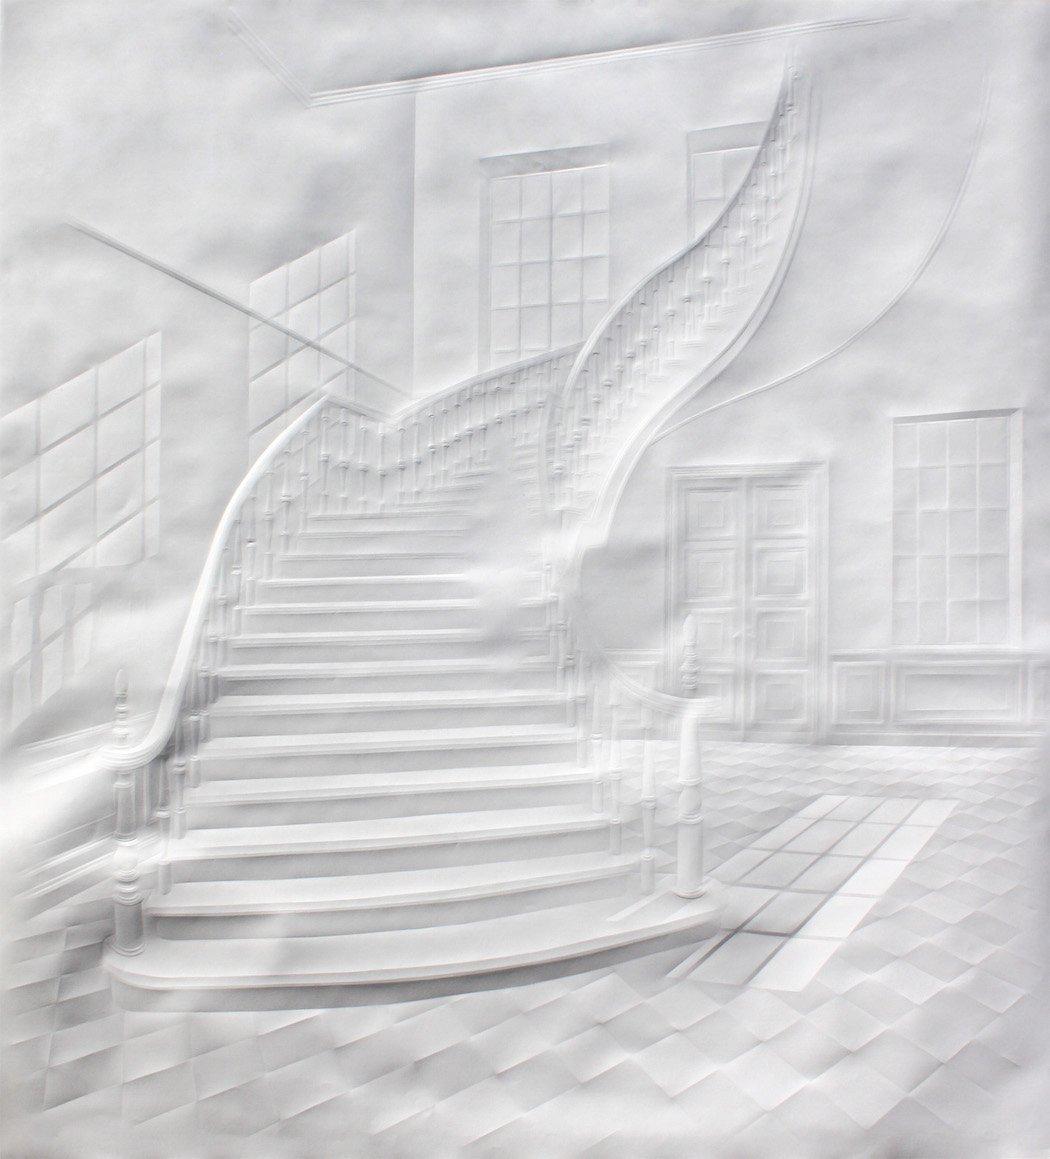 simonschubert(large stairway), 2015, 120cm x 110cm